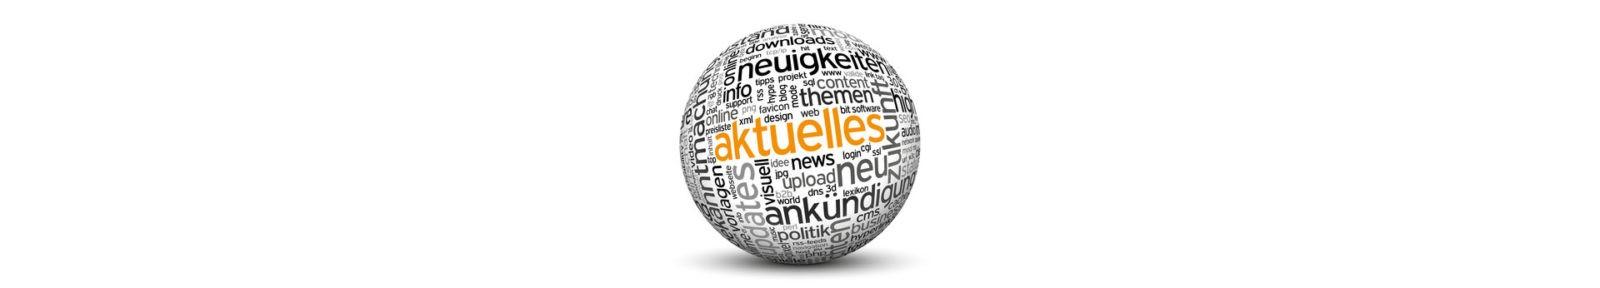 Newscenter Webdesign Lünsmann